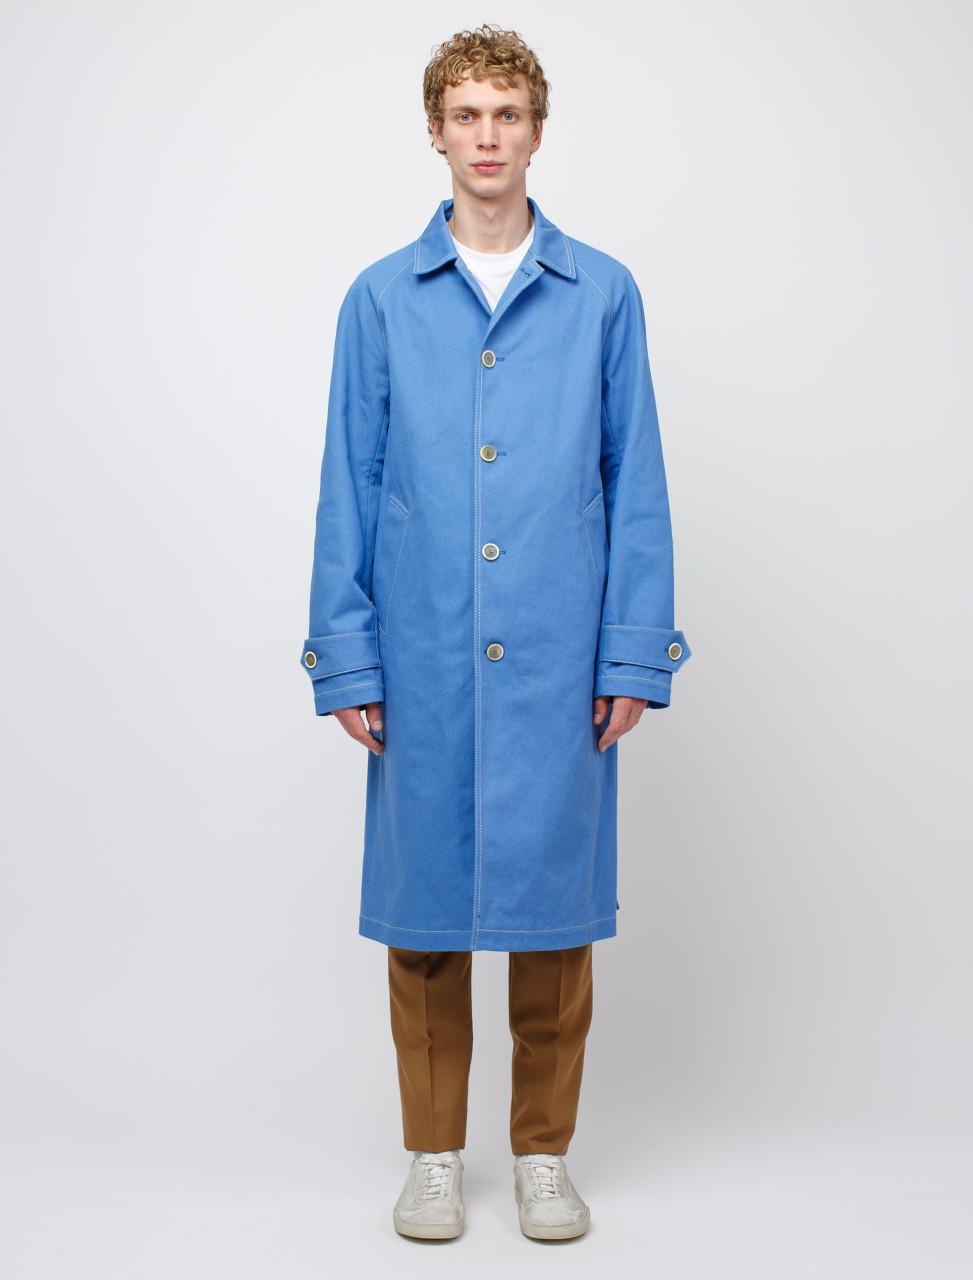 Coat in Light Blue